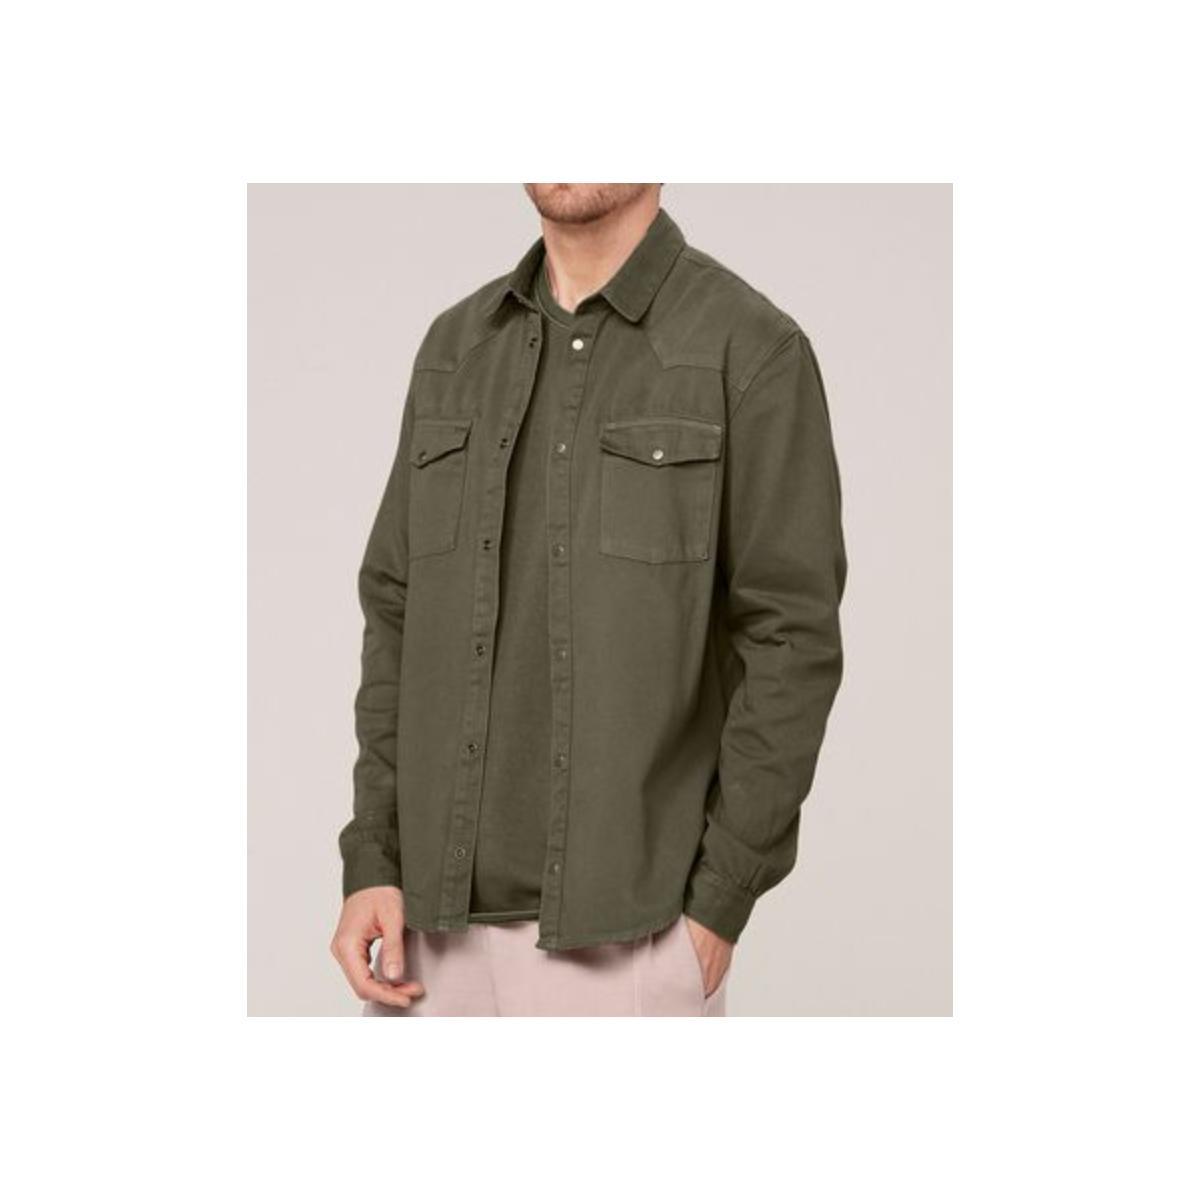 Camisa Masculina Dzarm Zil4 Eacsn Verde